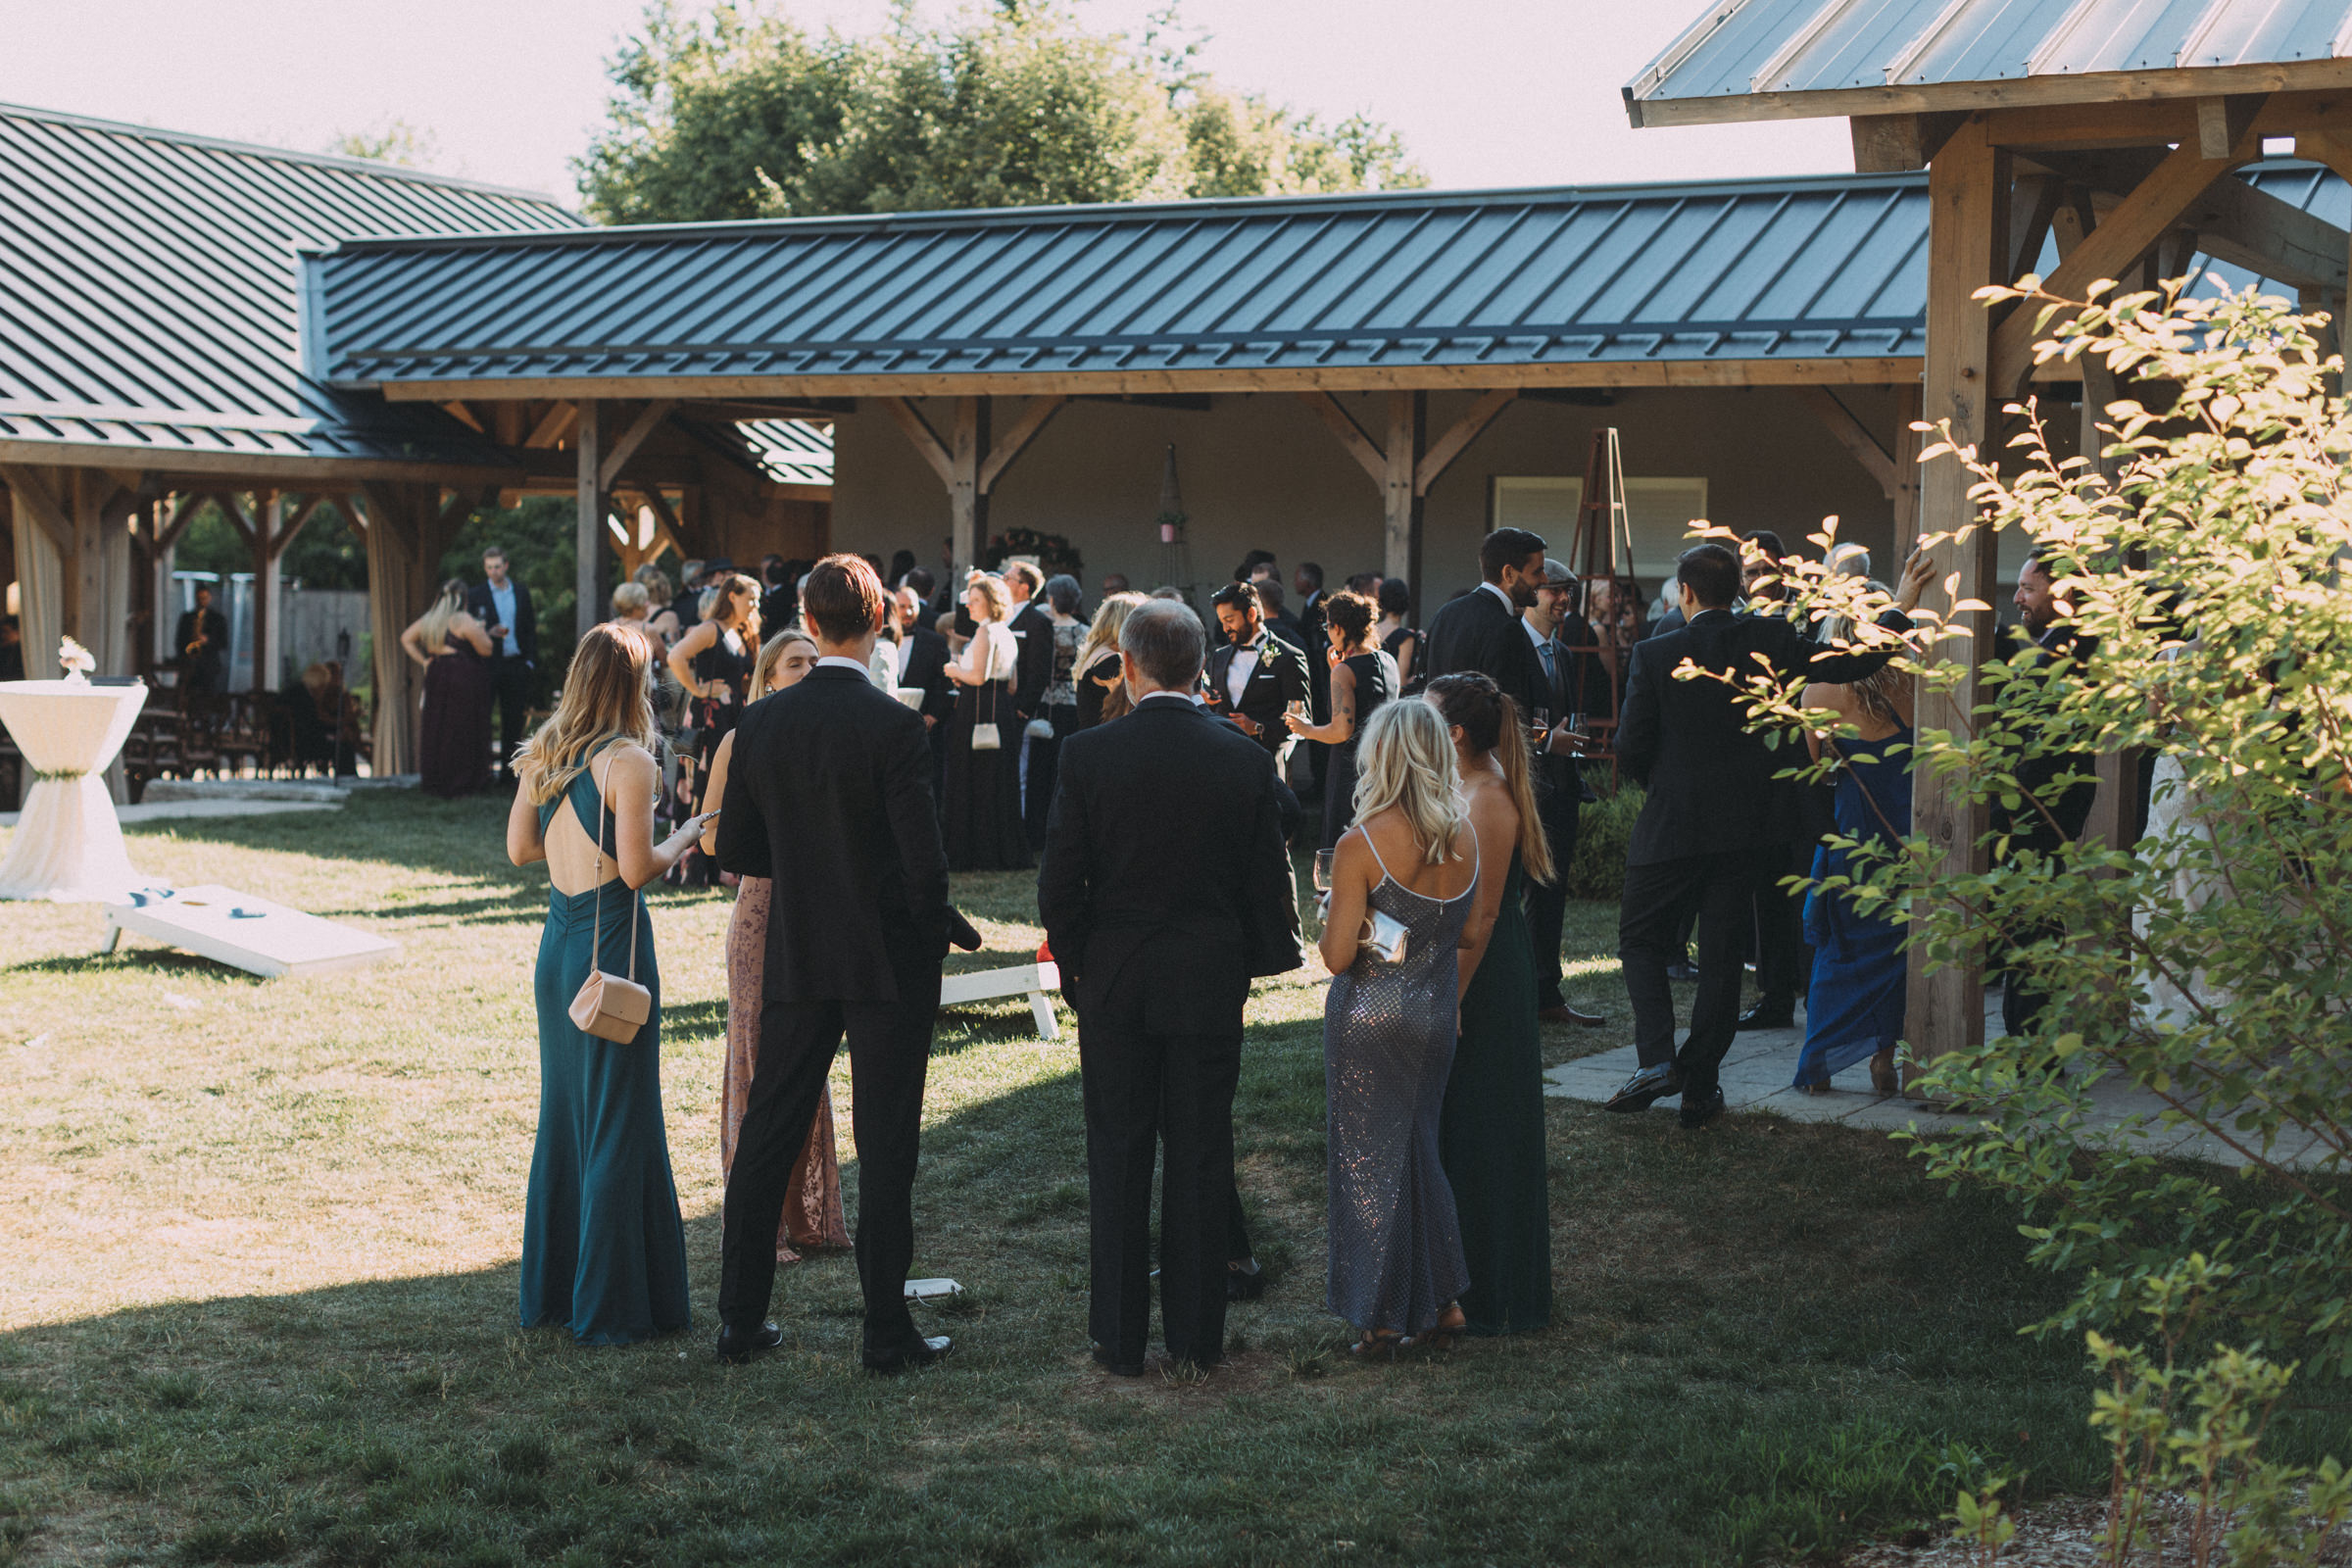 Langdon-Hall-wedding-photography-Cambridge-by-Sam-Wong-of-Visual-Cravings_Sarah-Ryan_39.jpg